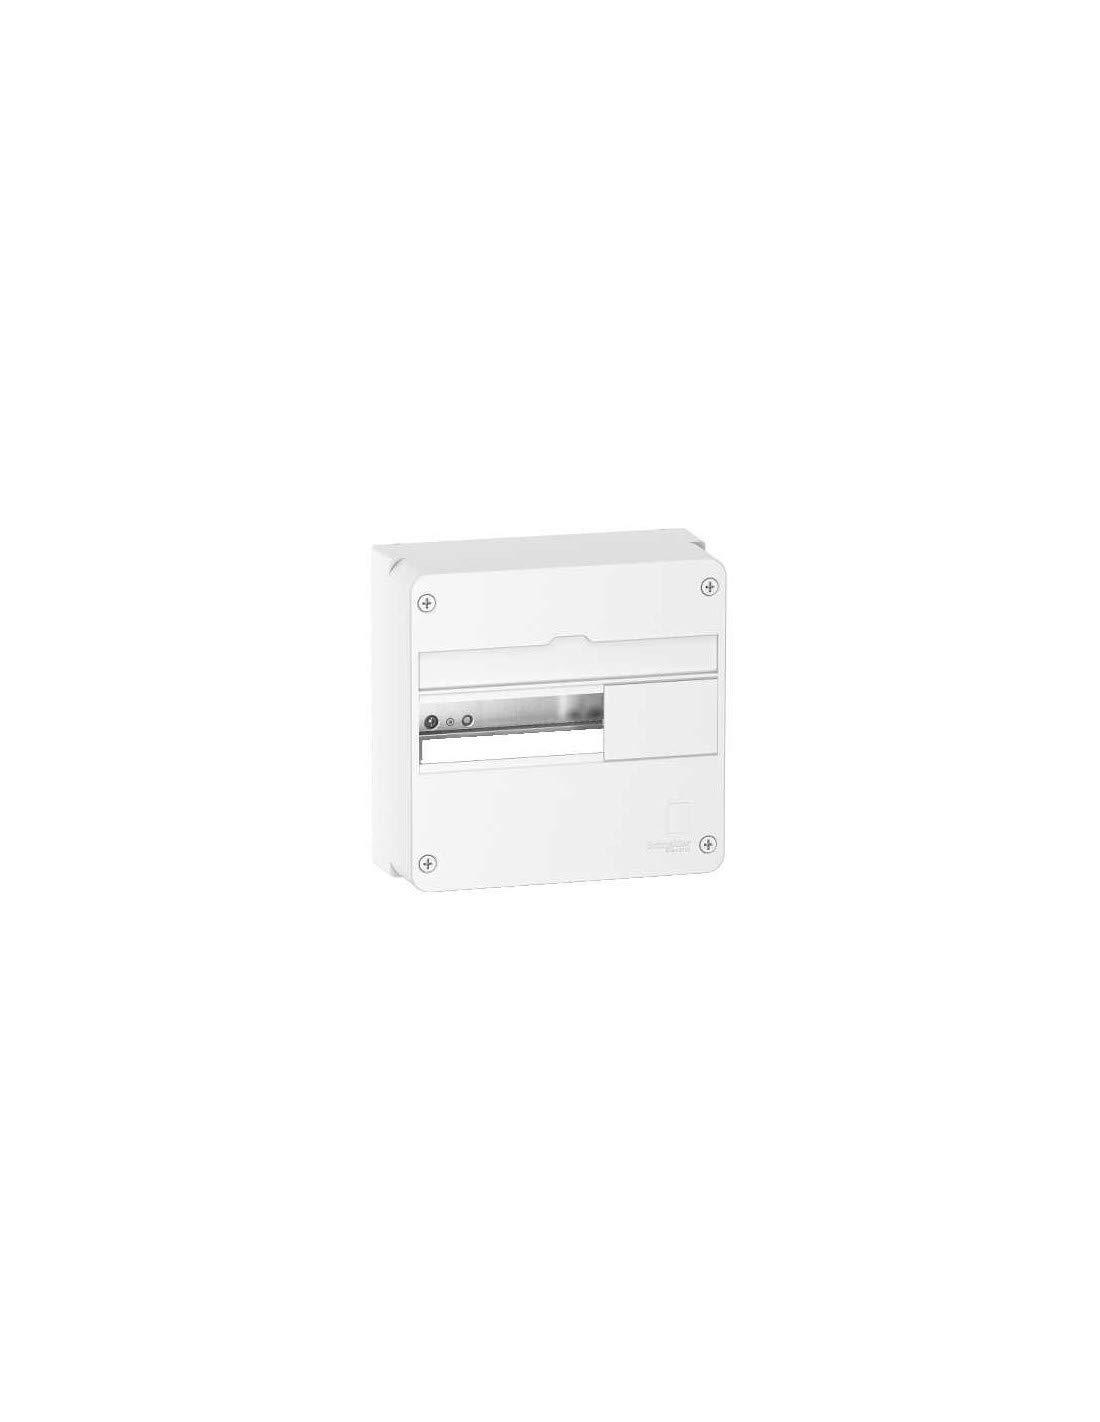 SCHNEIDER - Resi9 coffret de communication tri SCHNEIDER R9H10525 - SCH-R9H10525 Schneider Electric